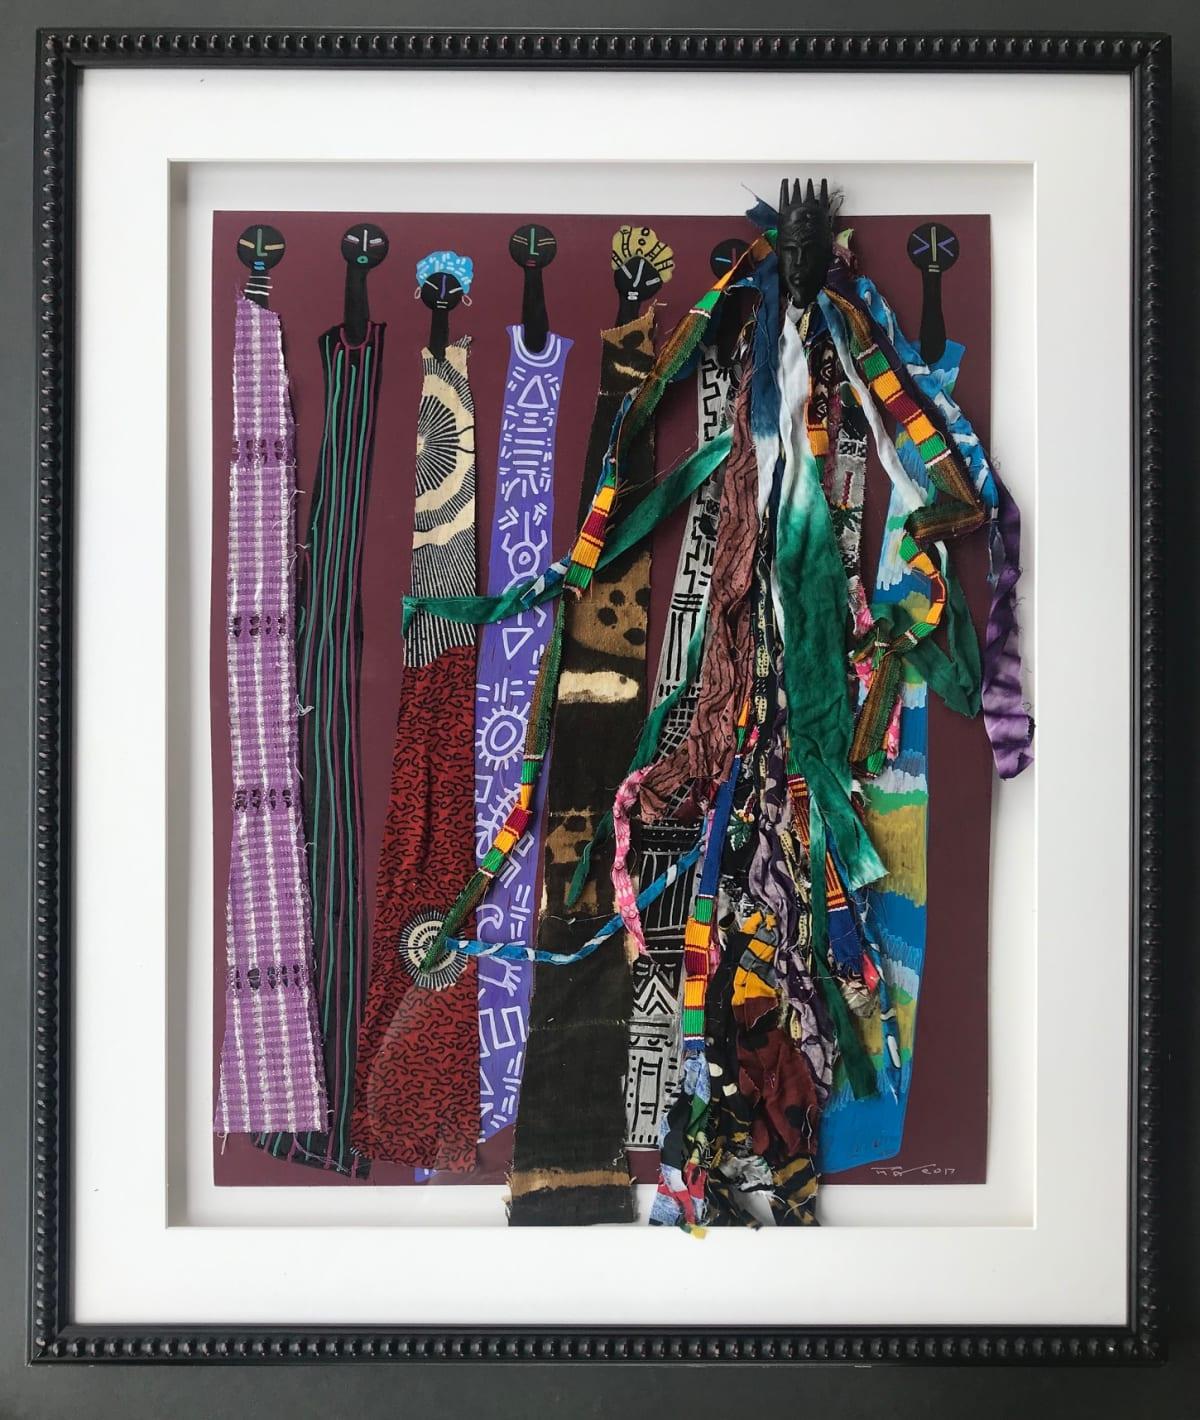 Frank Frazier Zuri (Beautiful), 2017 Mixed Media Collage 26 1/2 x 33 1/2